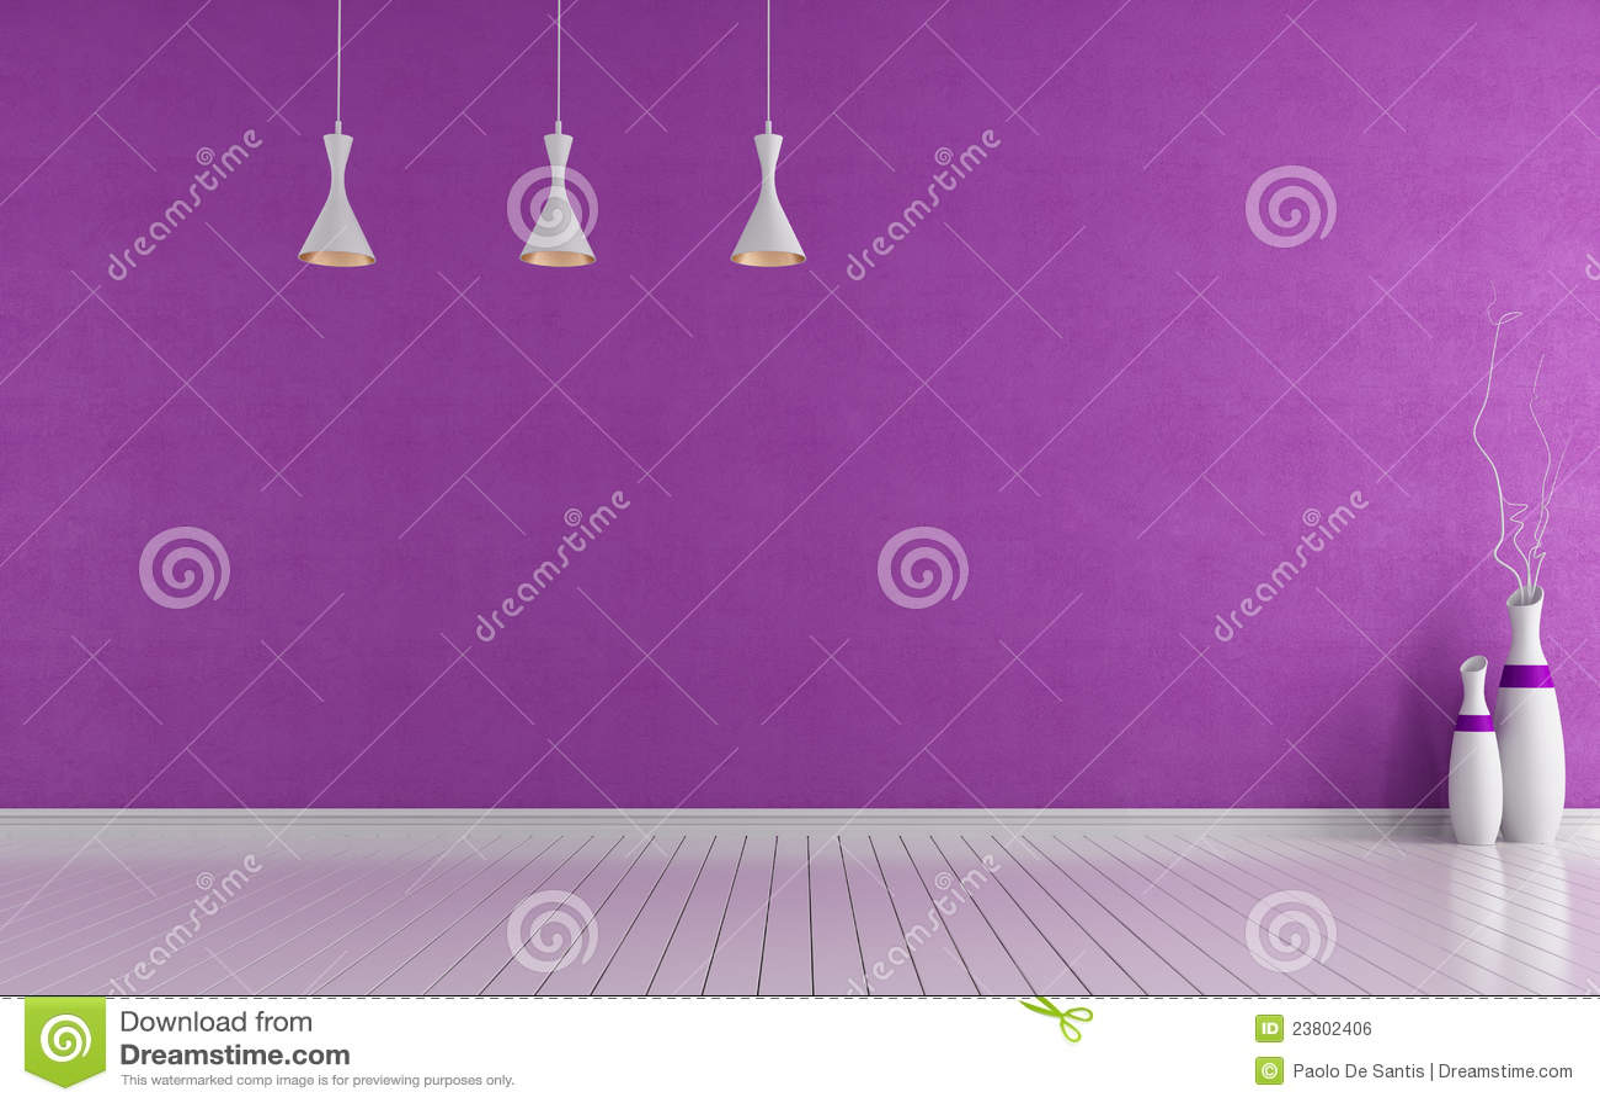 Sitio púrpura vacío